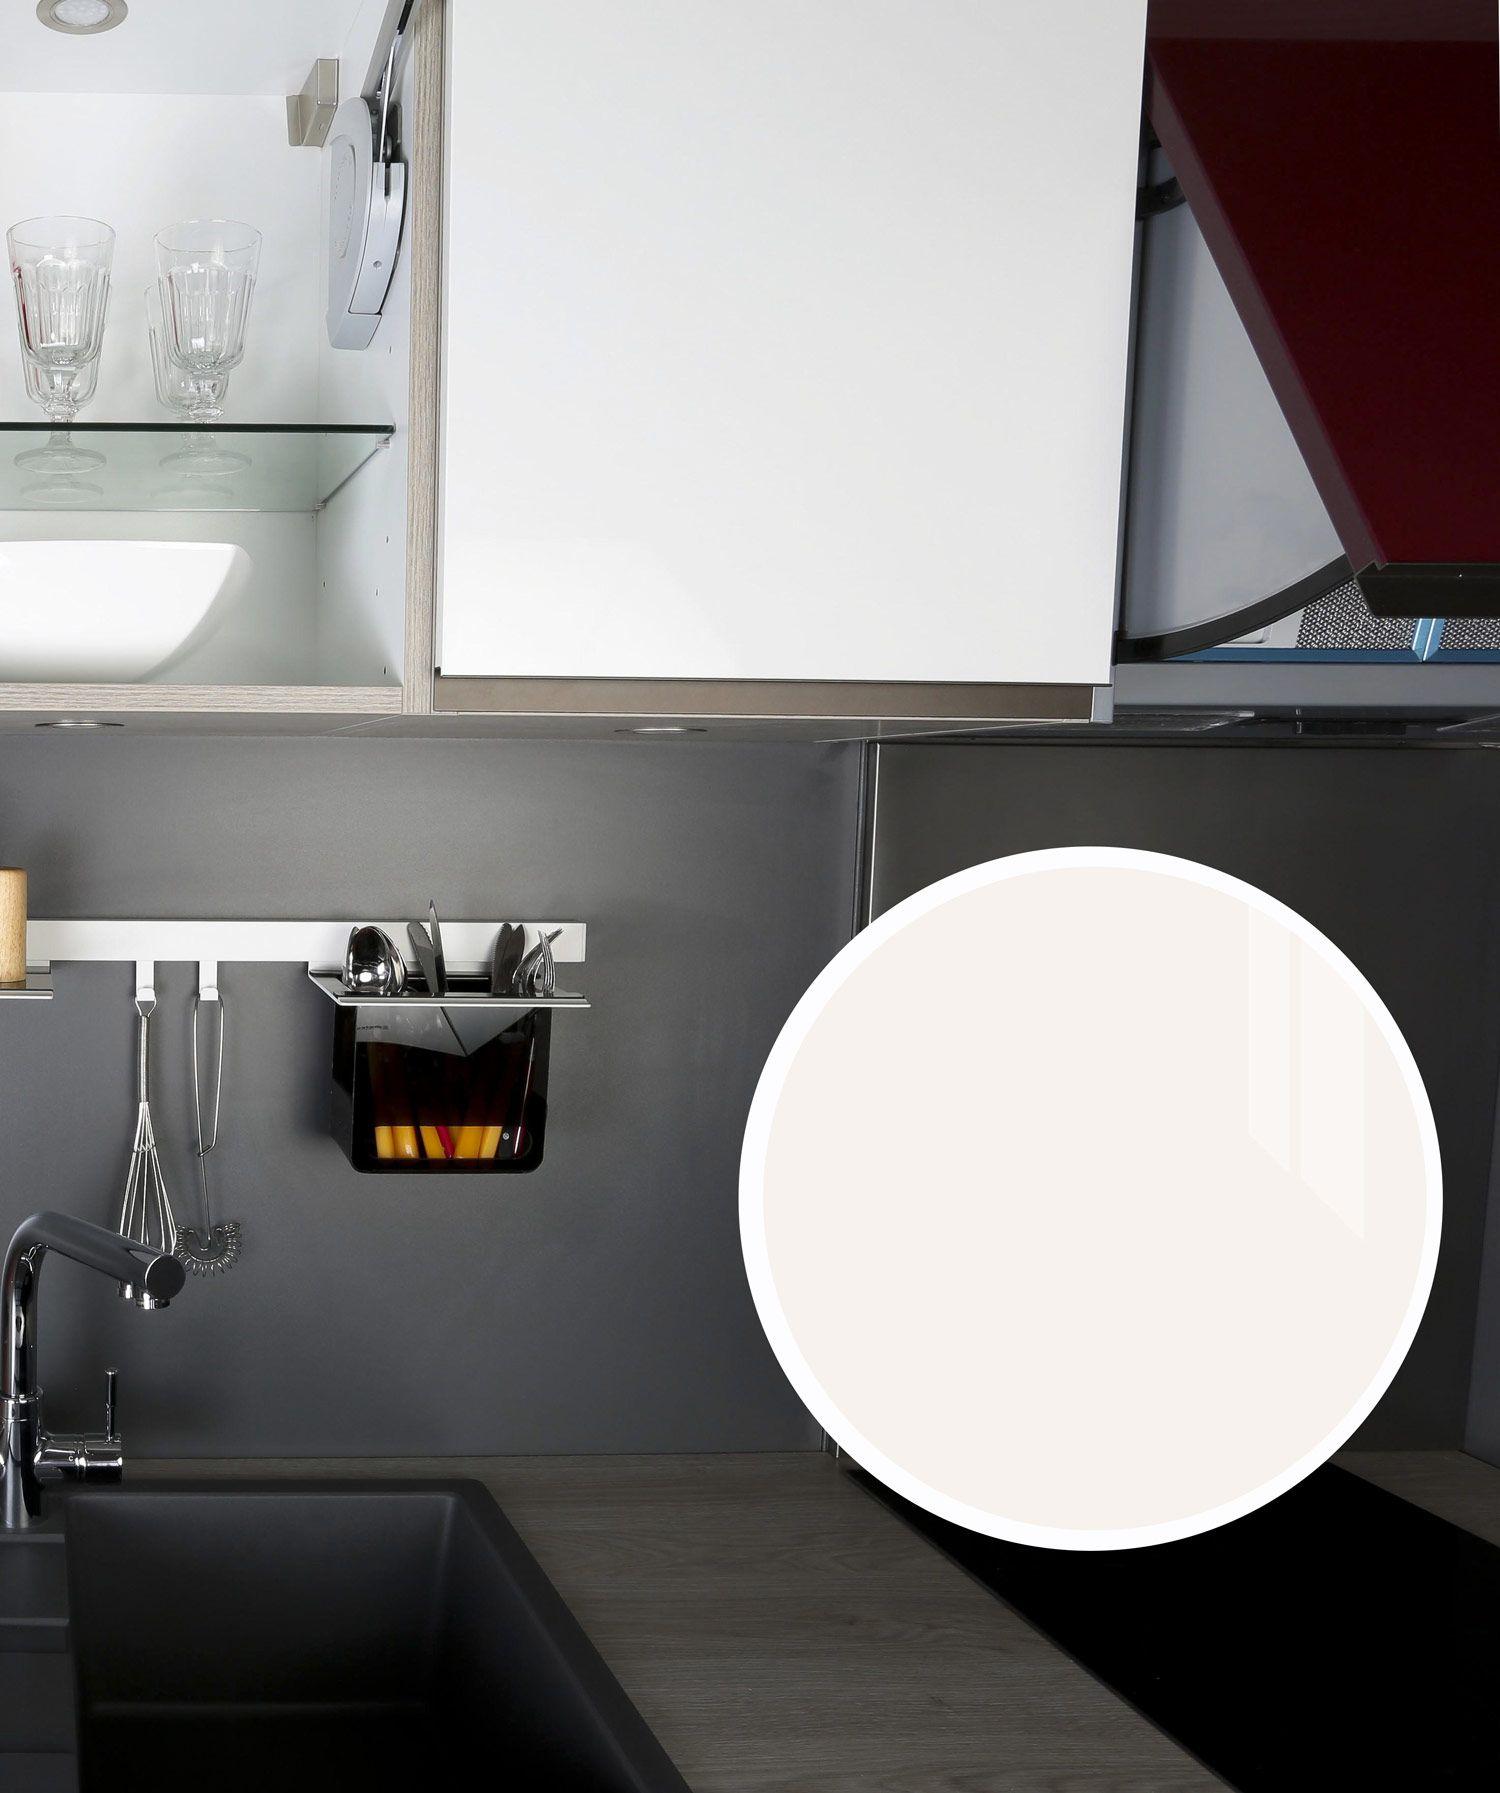 socoo c brive socoo c nice beau faades socoo c blanc glac mat cuisine fa tout avis socoo c. Black Bedroom Furniture Sets. Home Design Ideas